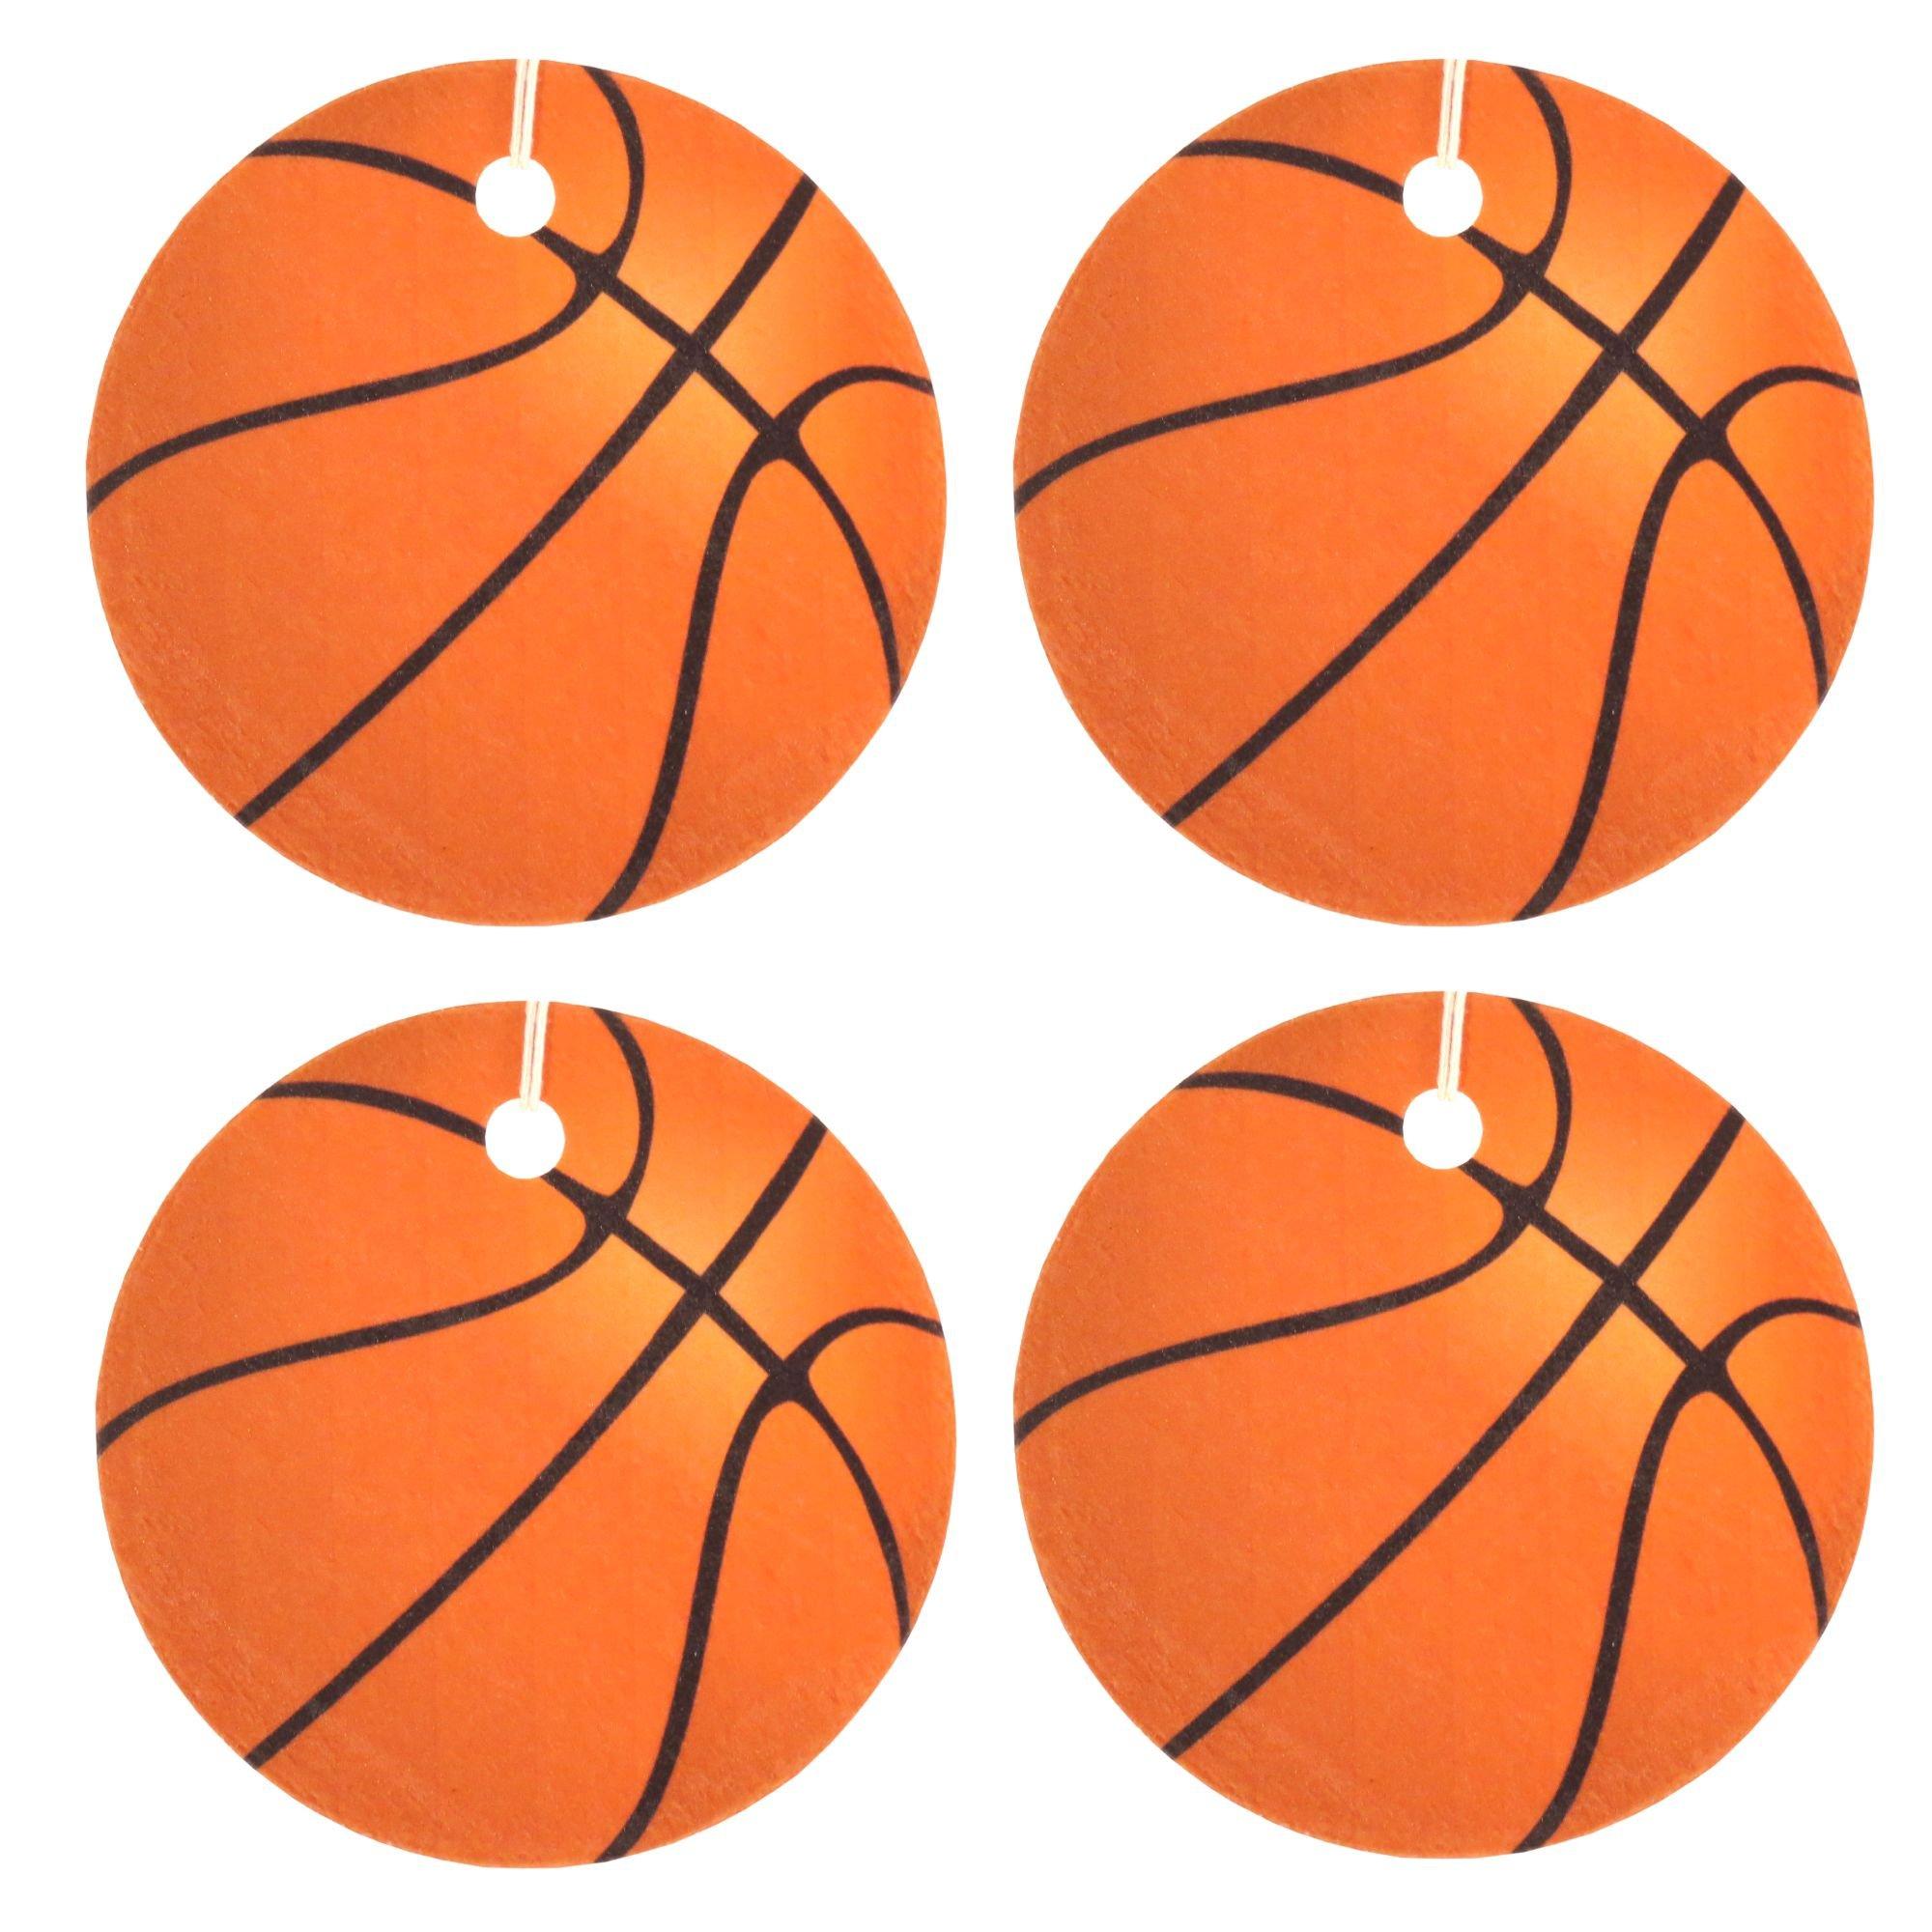 Set of Four Basketball Air Fresheners, Cedarwood Essential Oil